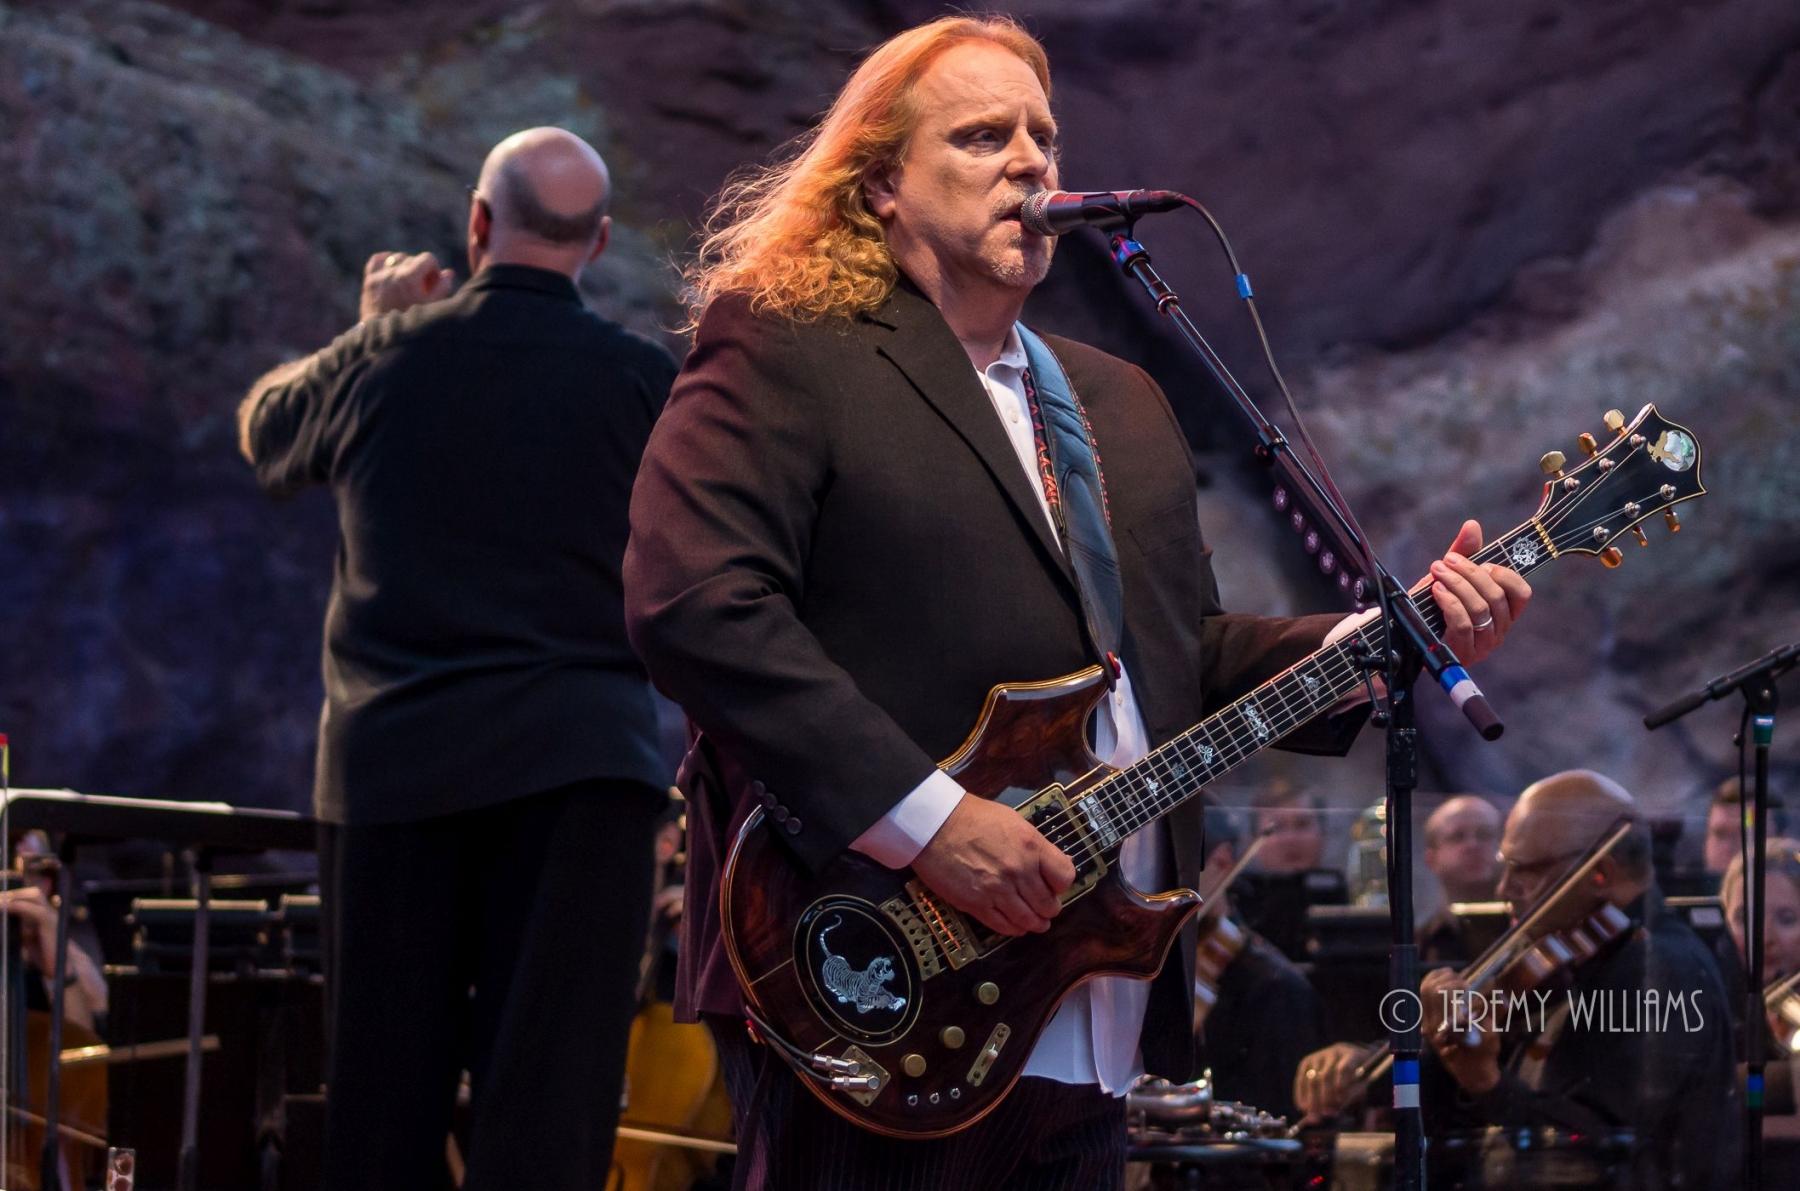 Warren at Red Rocks 2016